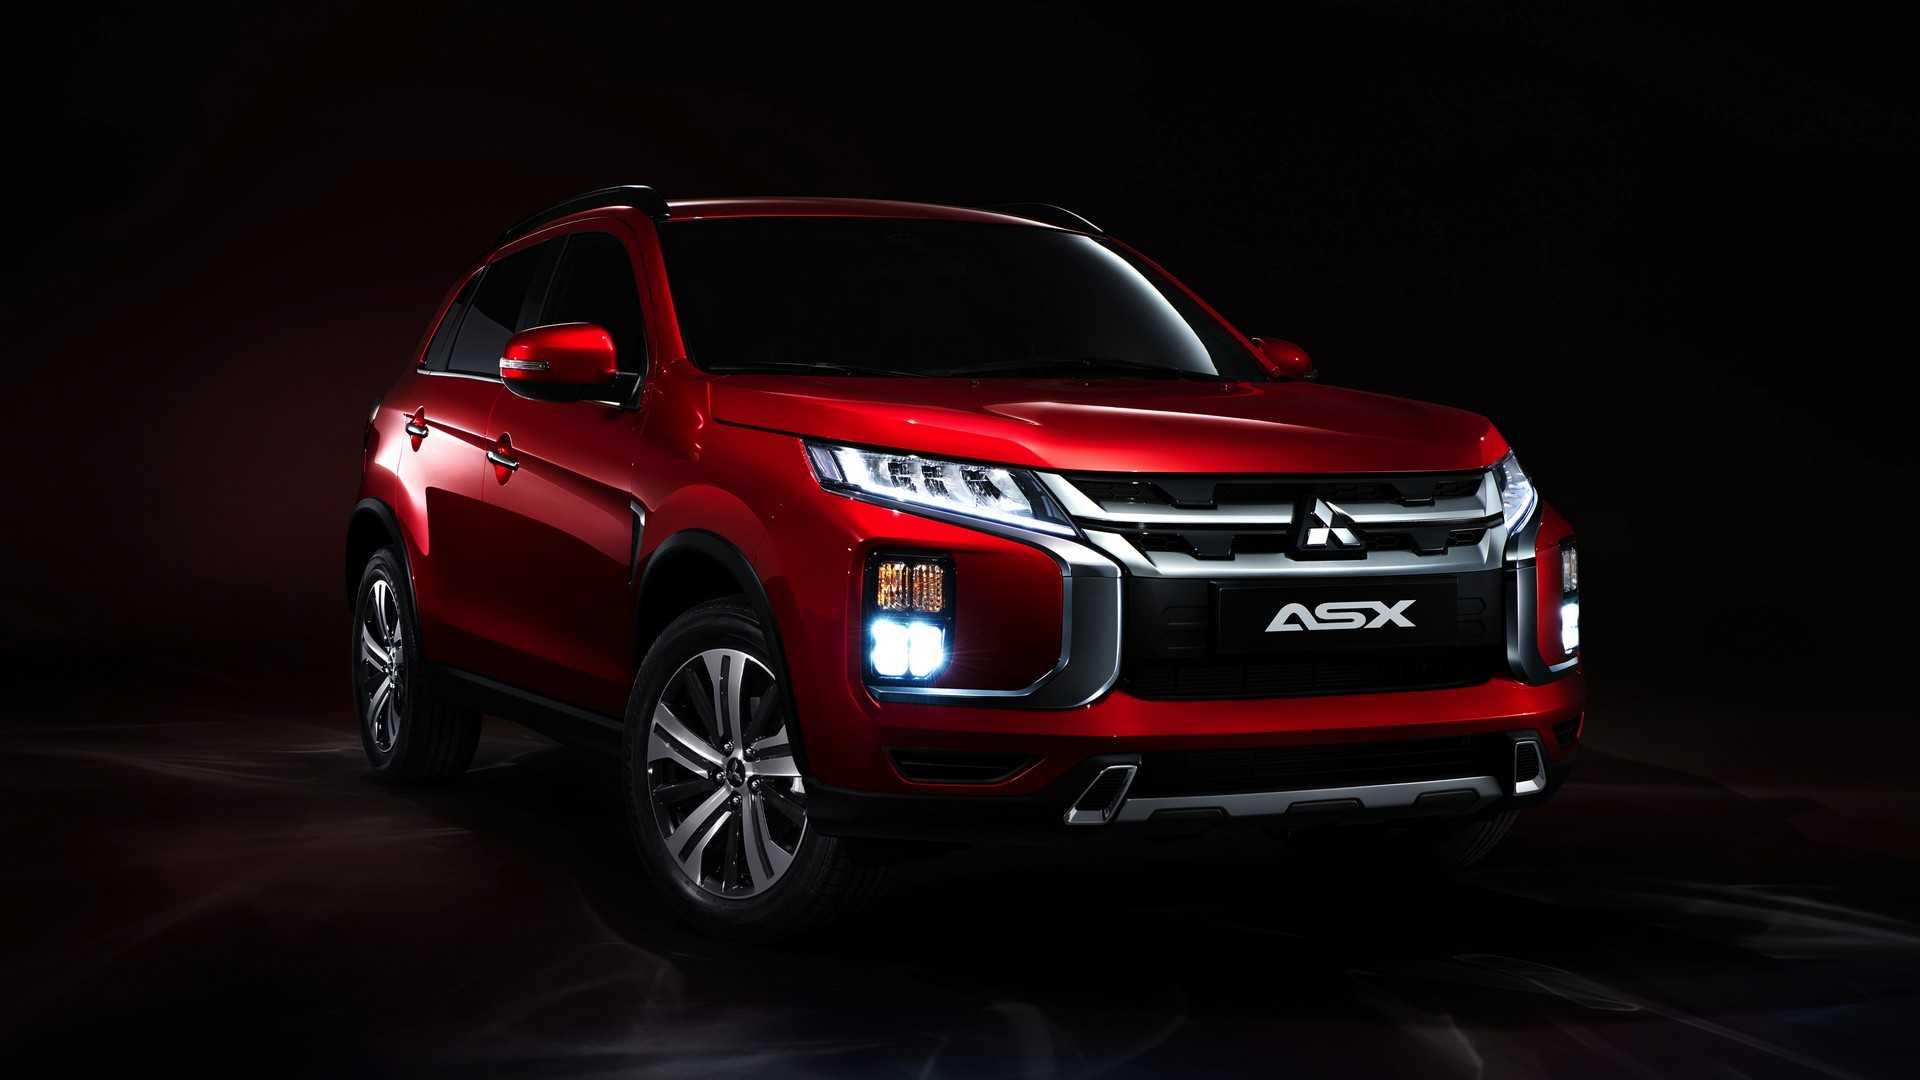 28 New Mitsubishi Asx 2020 Uk Research New for Mitsubishi Asx 2020 Uk